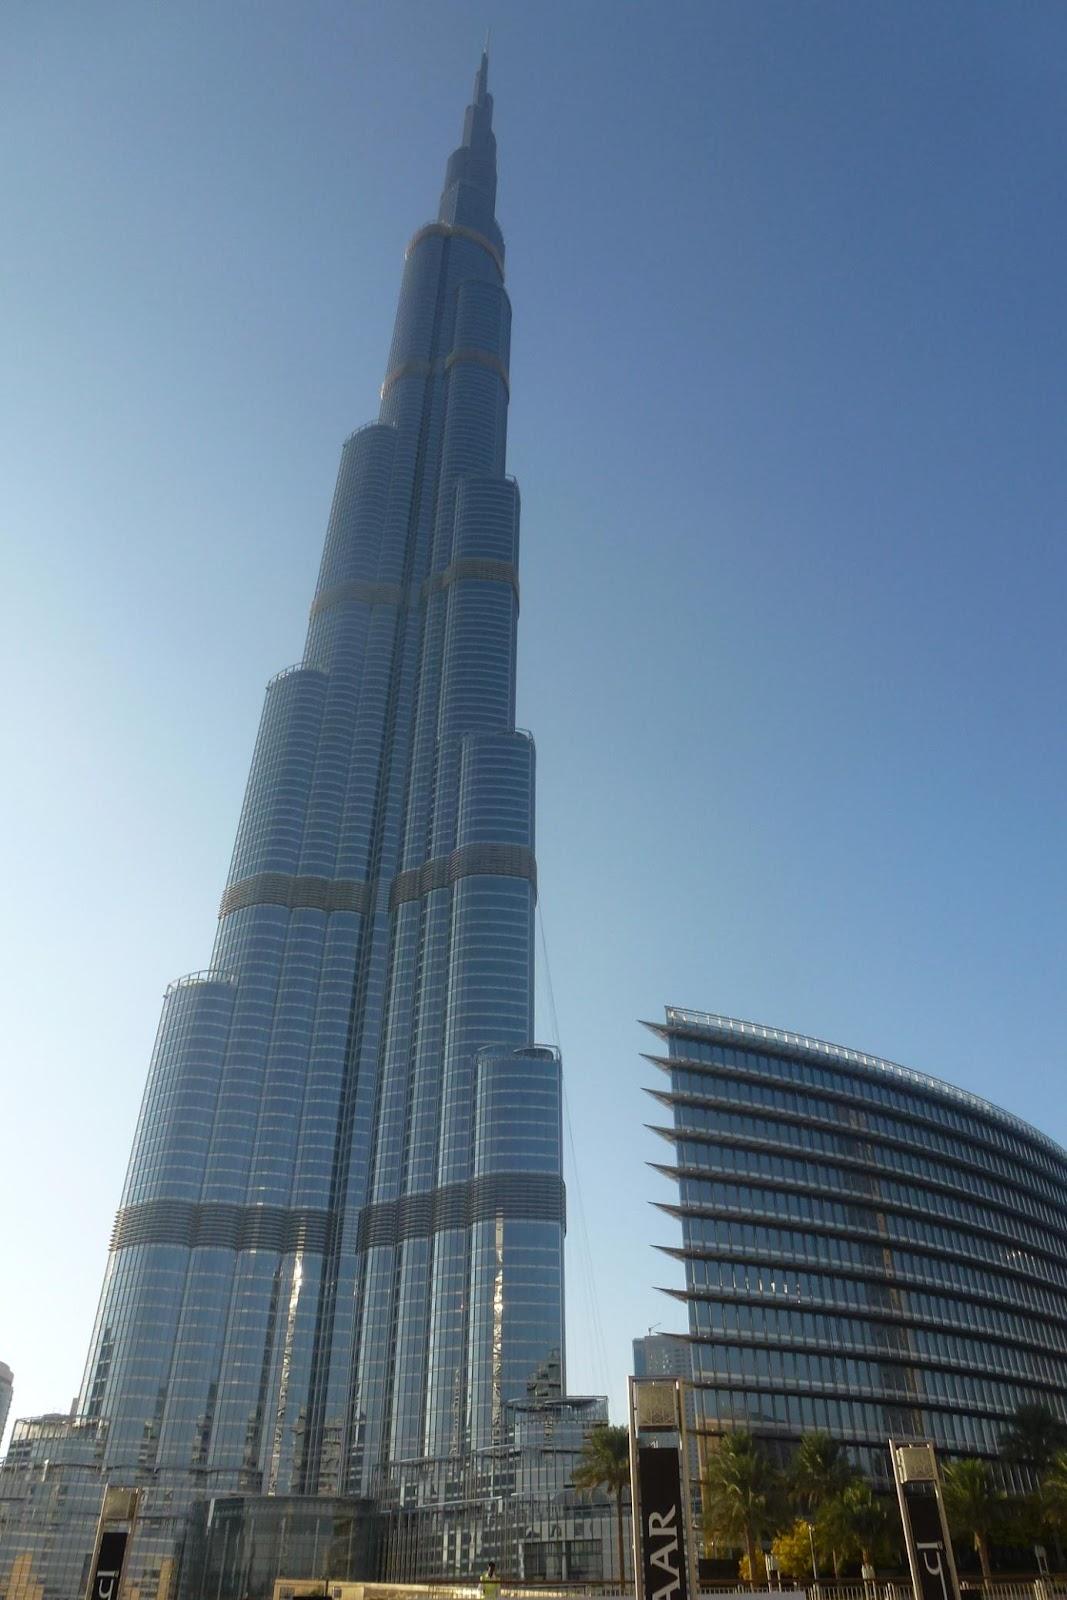 C:\Users\Silla\Pictures\2012-06-25\Dubai december 2012\P1000474.JPG